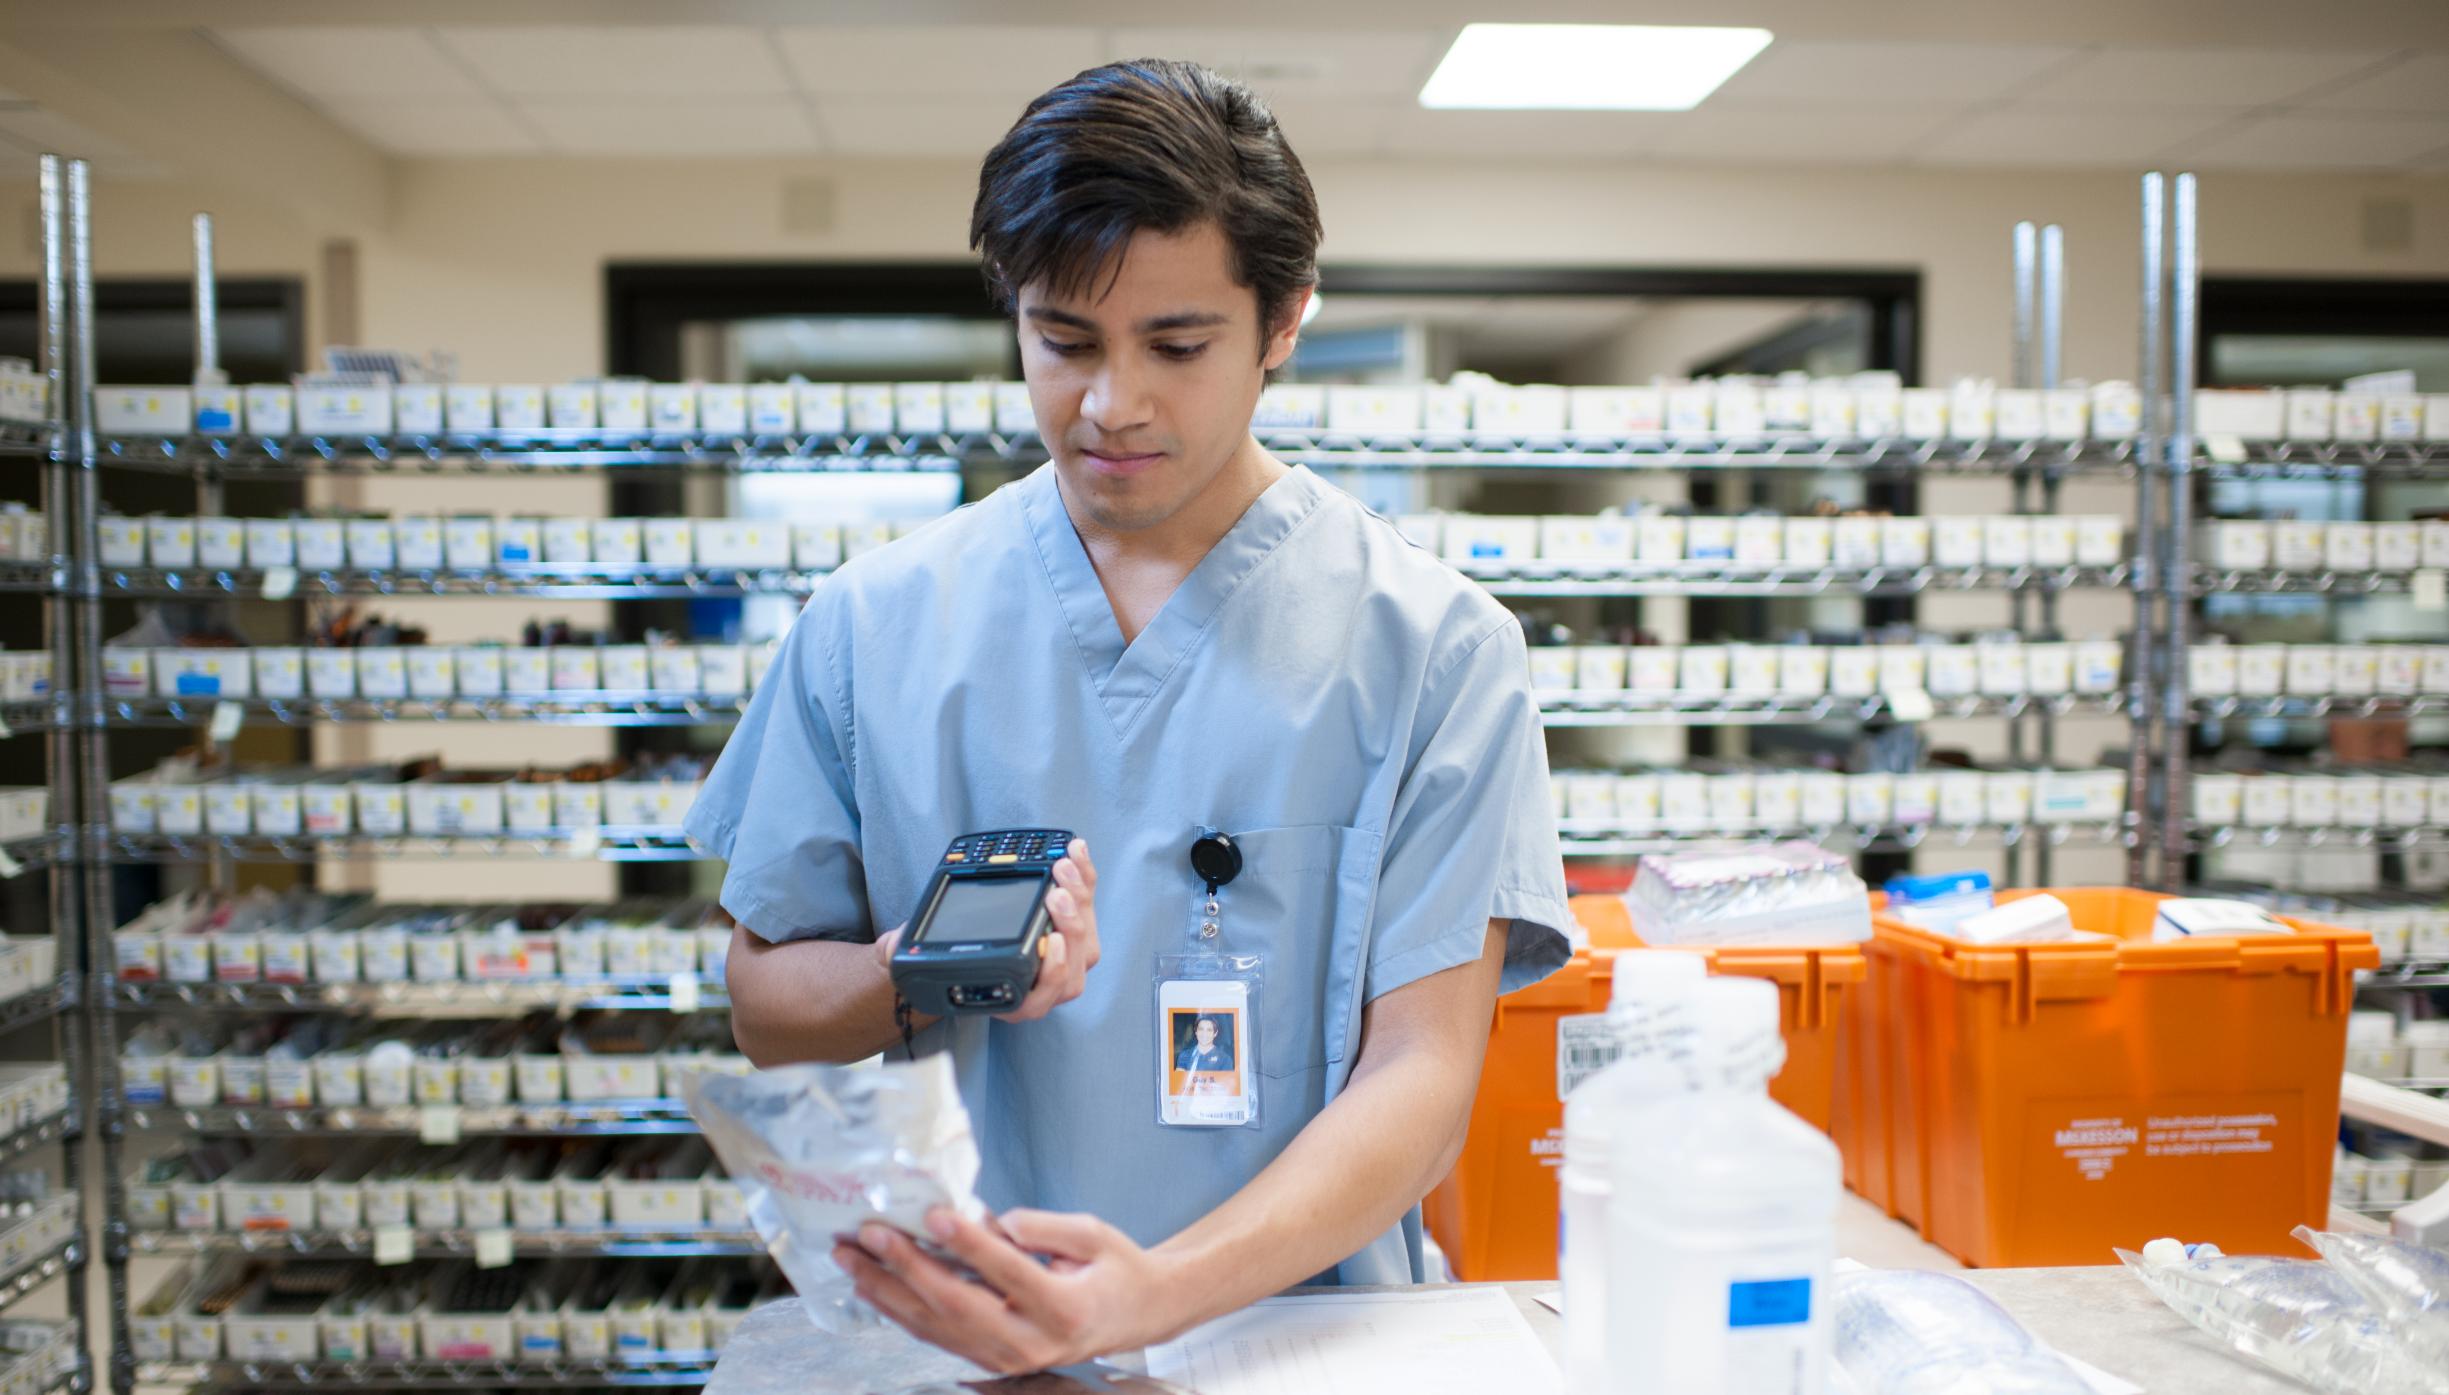 Inpatient hospital pharmacy